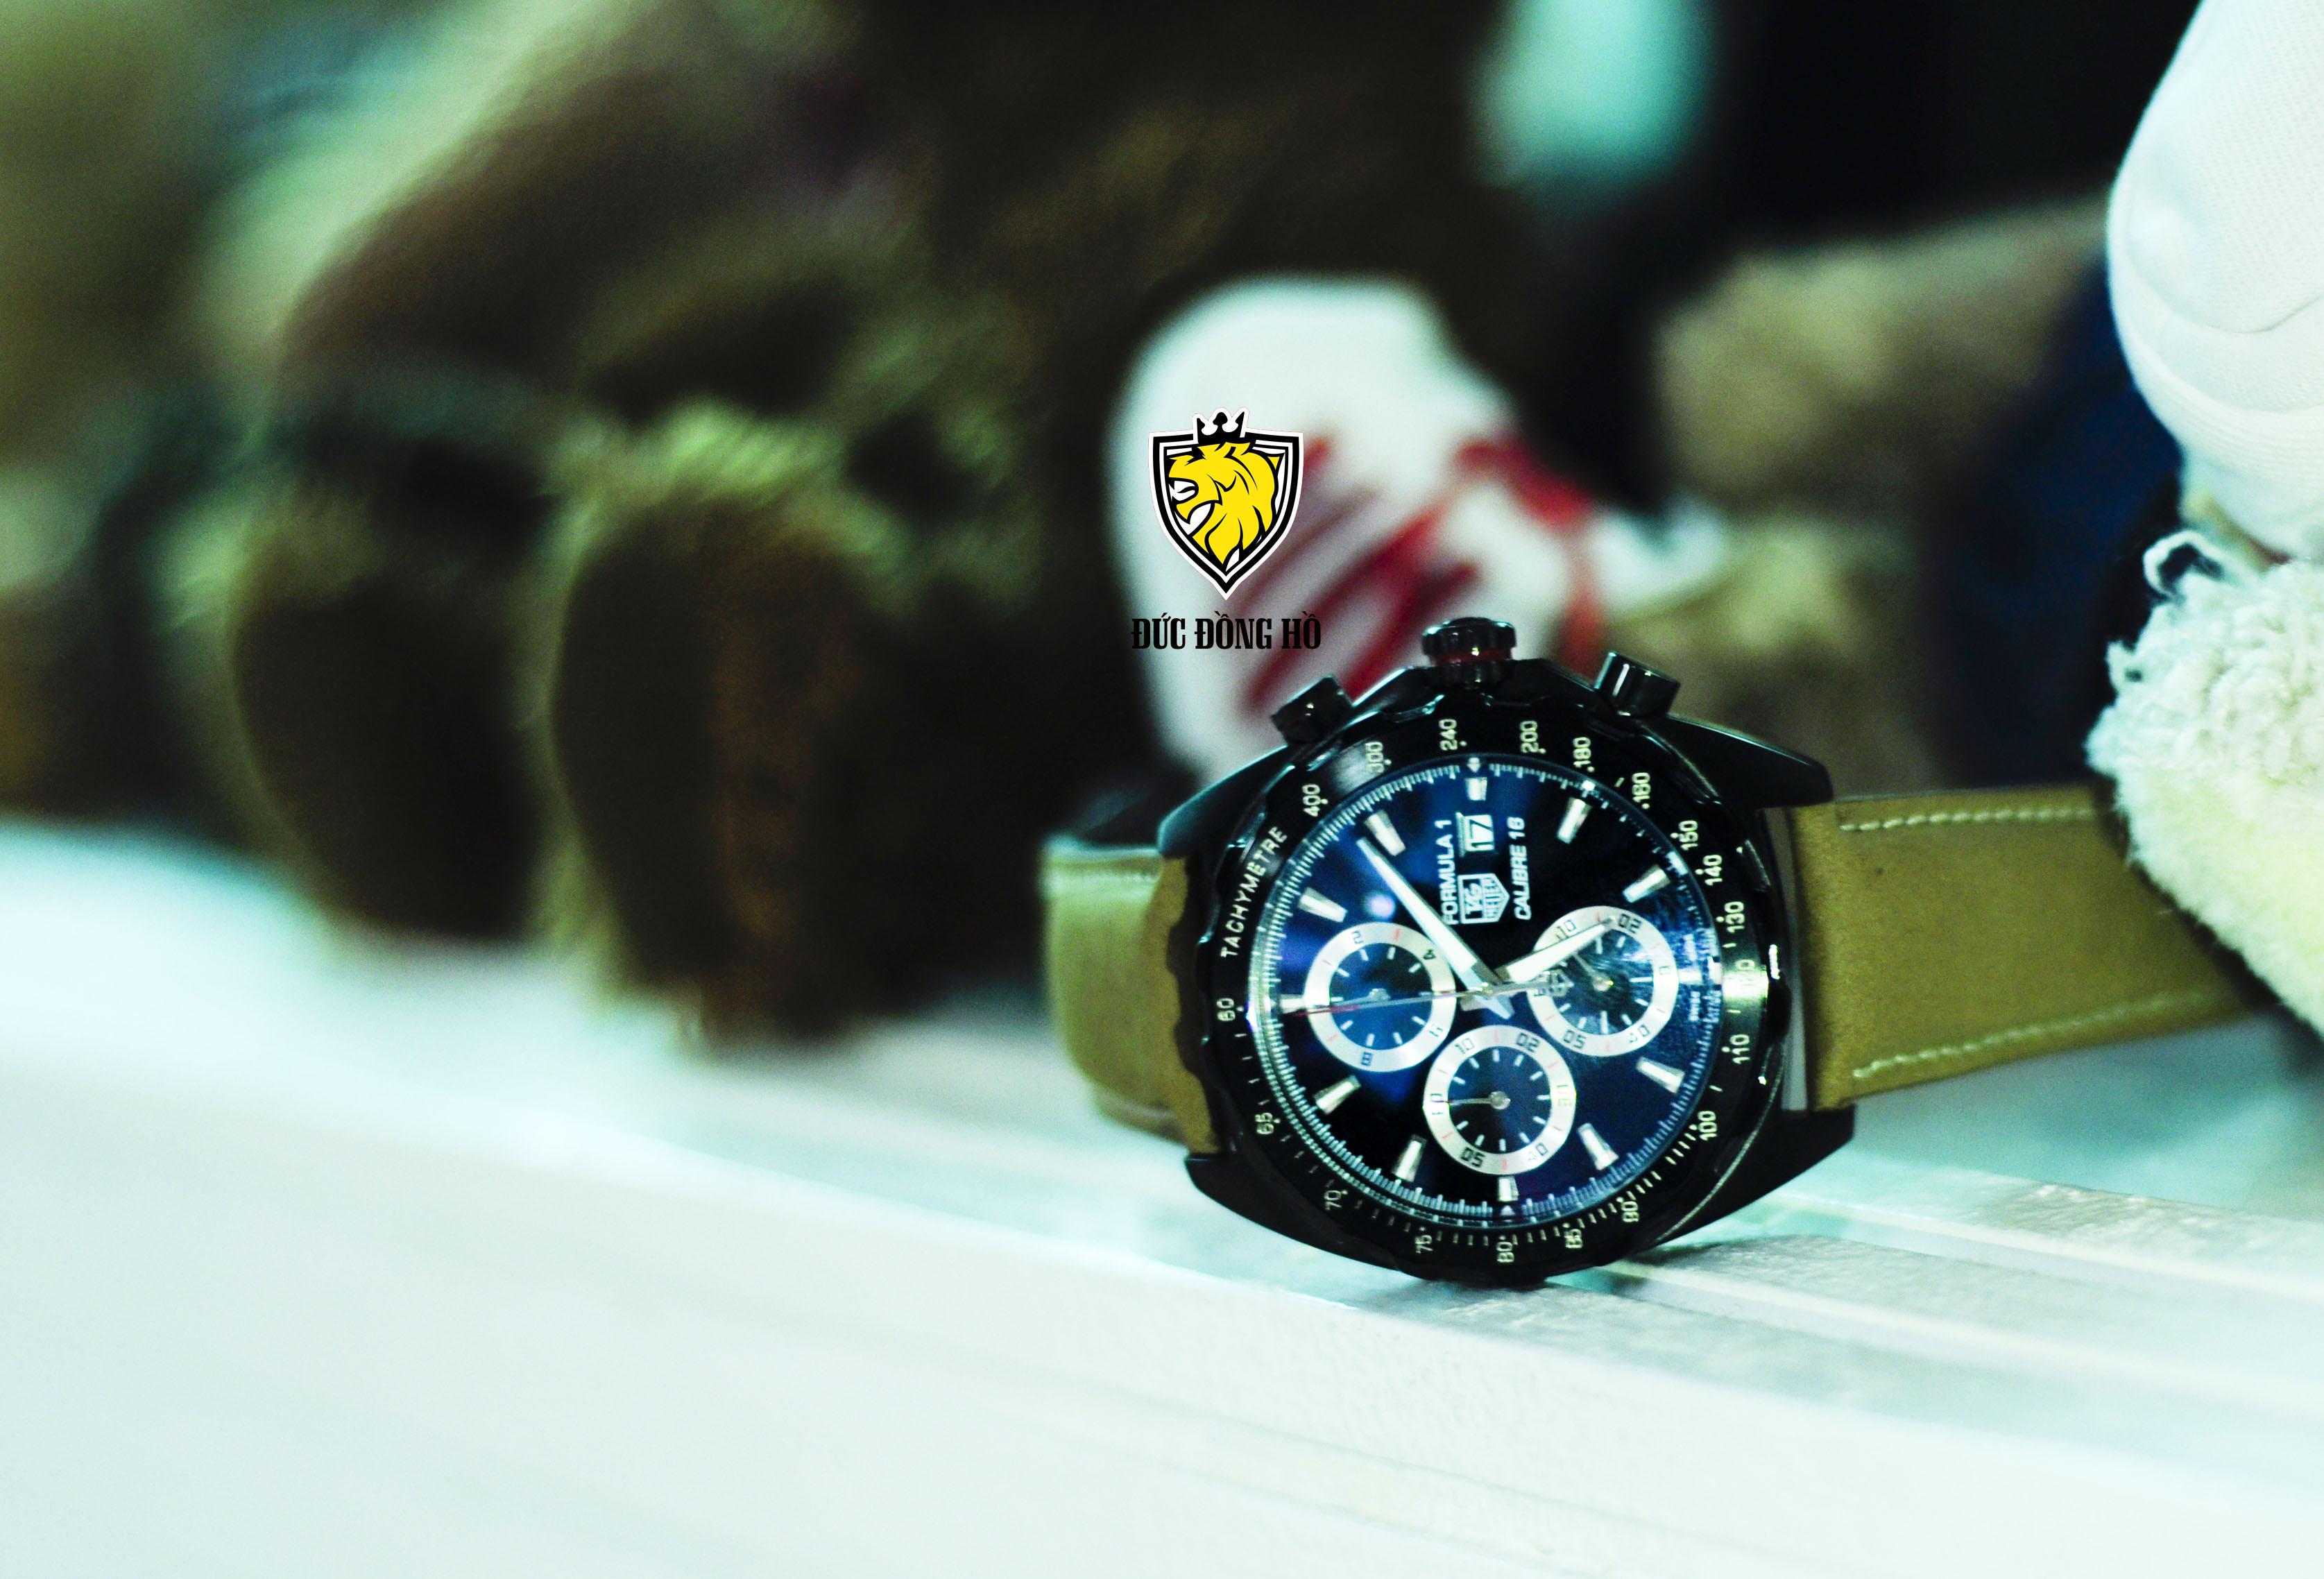 Đồng hồ Tag Heuer Nam 108